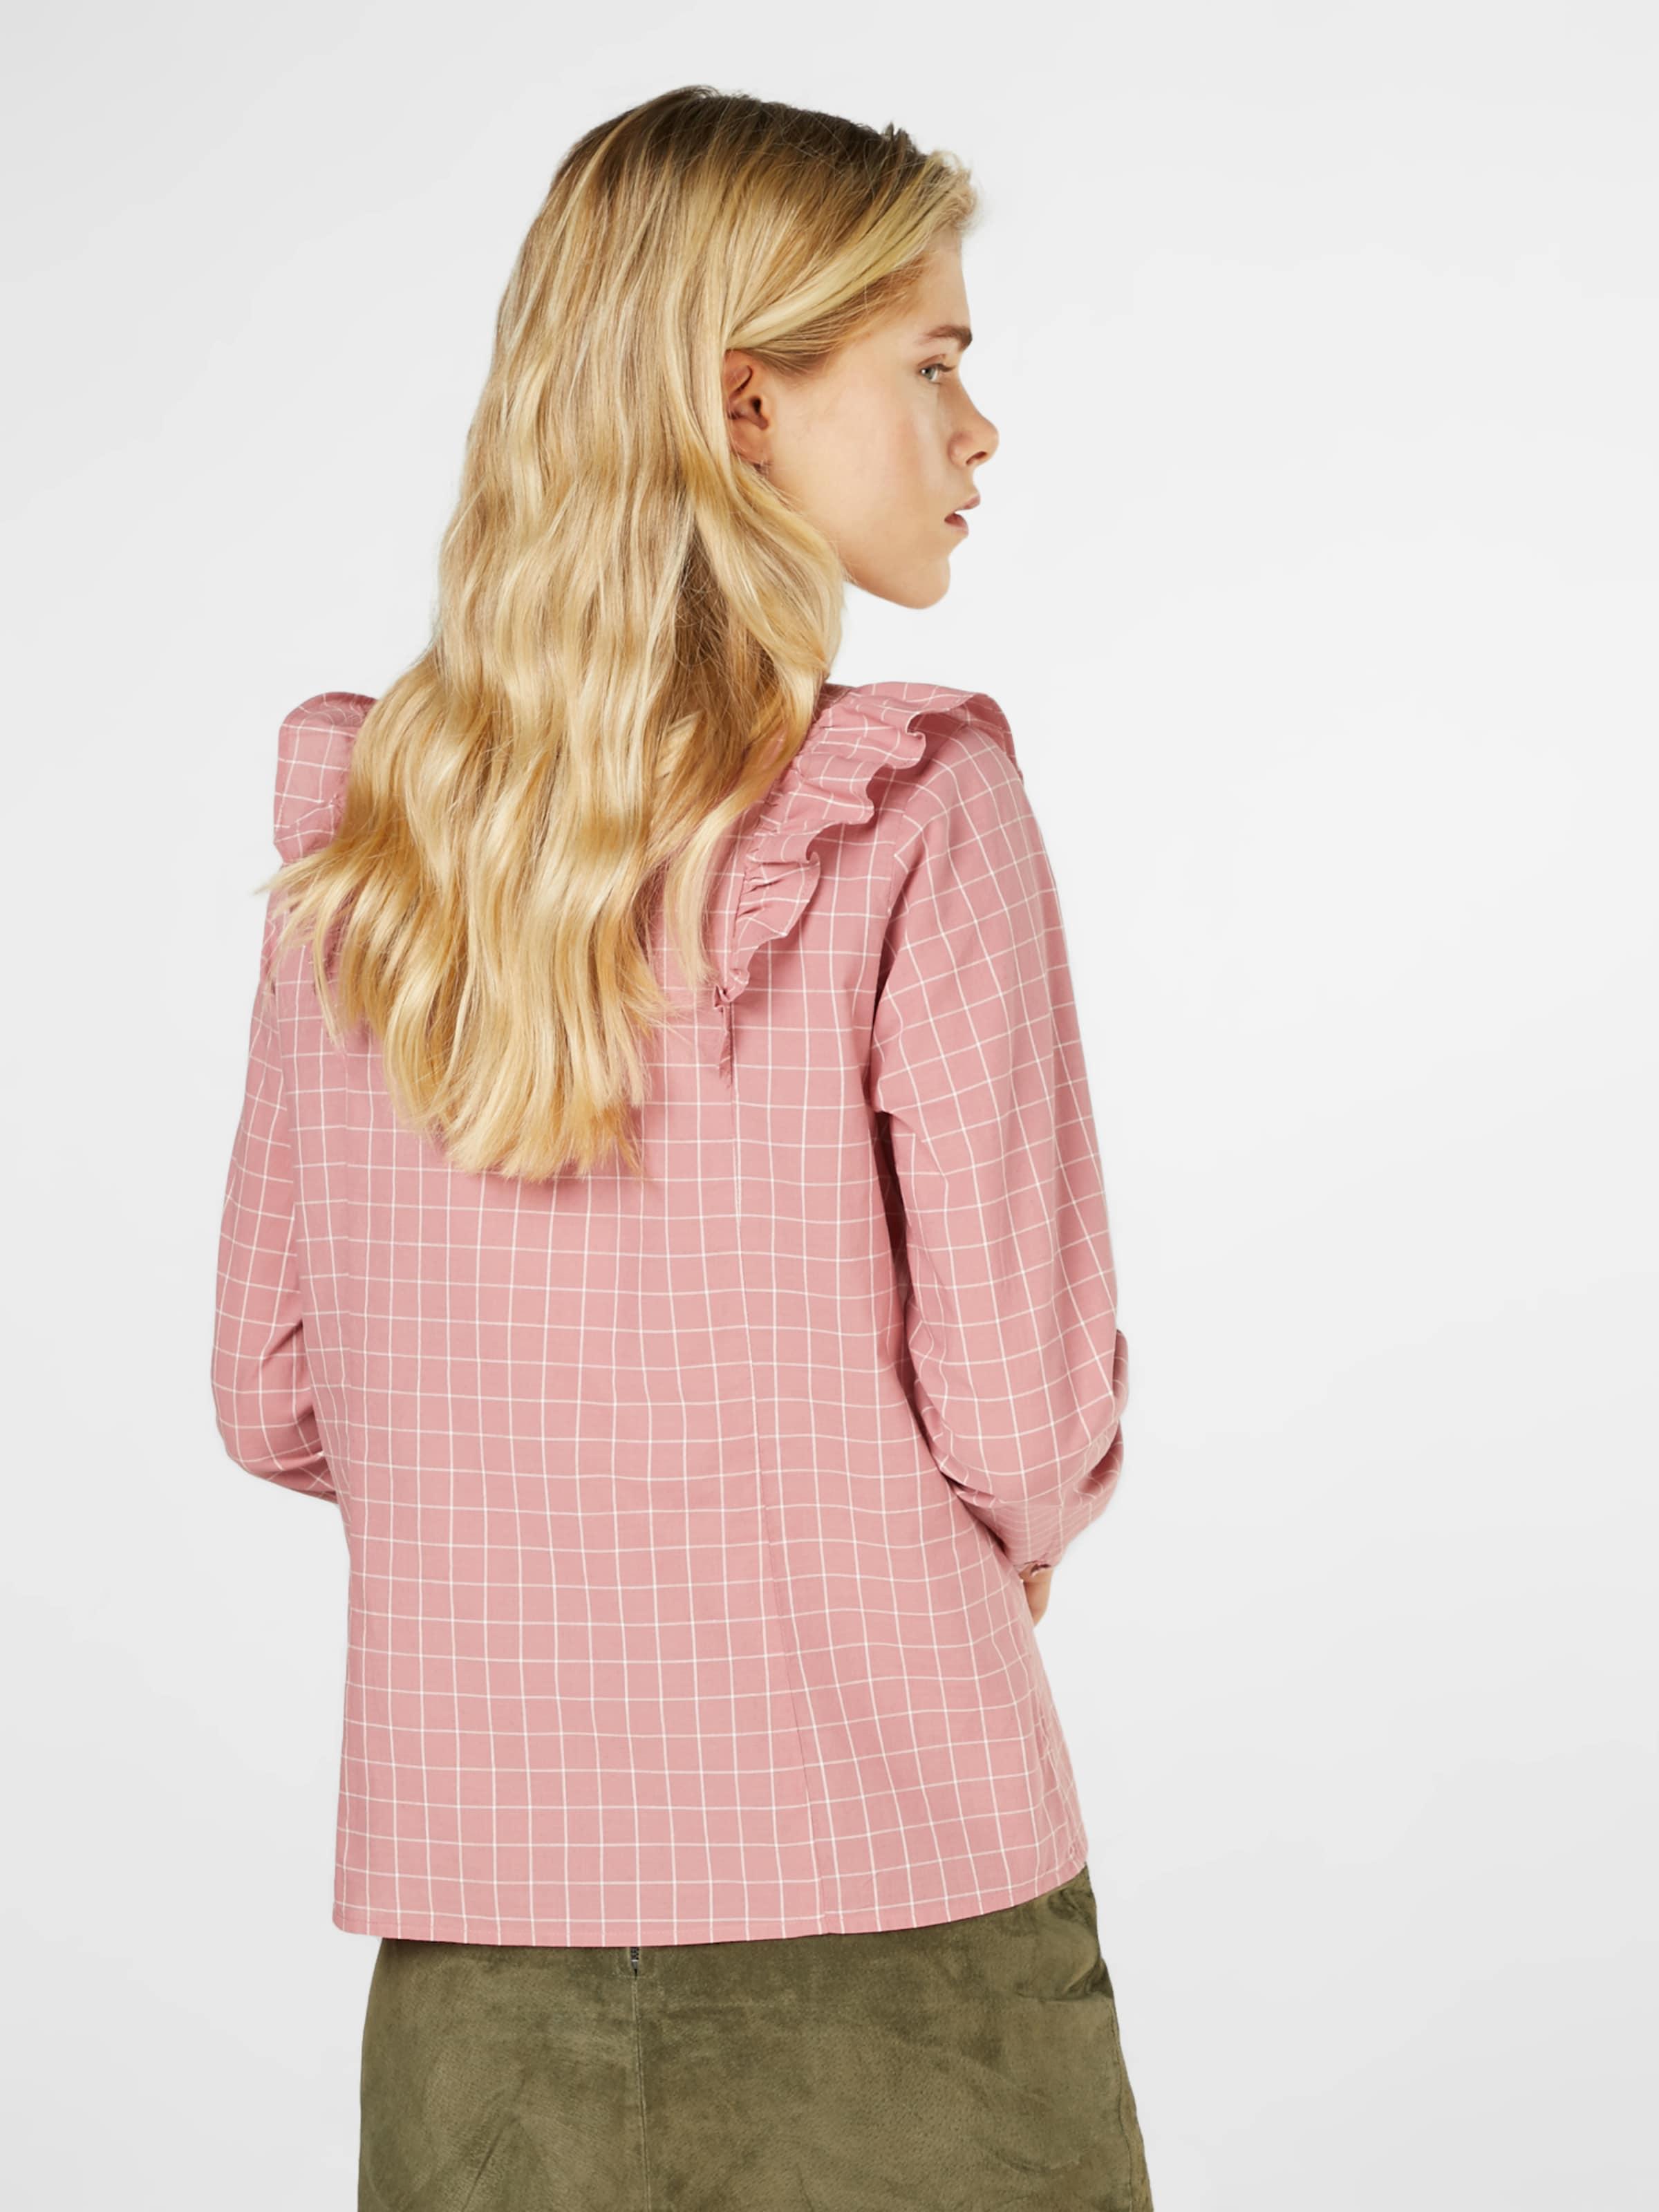 Verkauf Perfekt Billig Verkauf Vermarktbare TOM TAILOR DENIM Bluse og4lWul